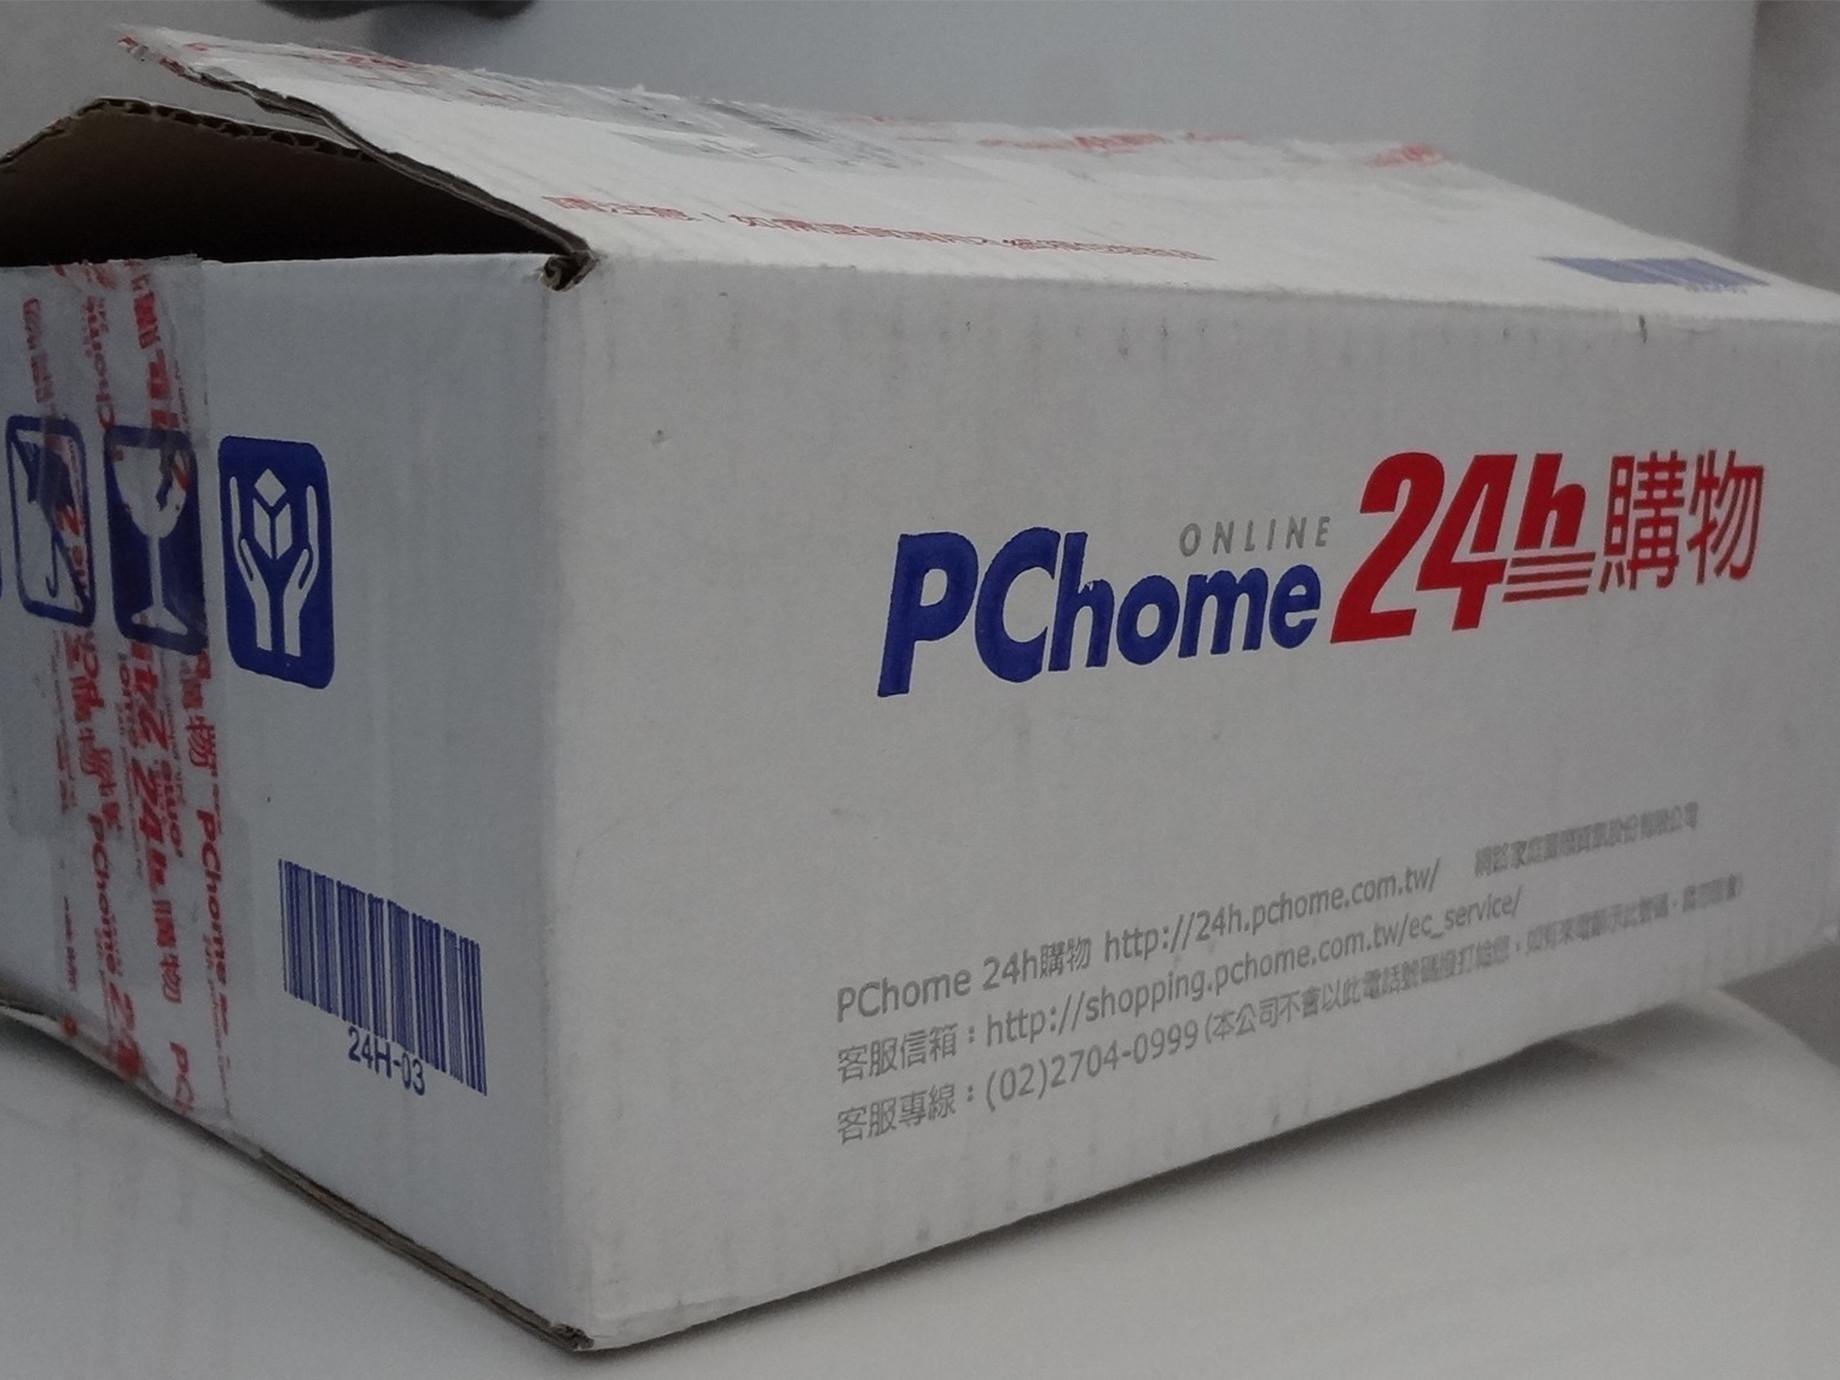 PChome合作美味生活開「店中店」,網紅變現時代來了嗎?